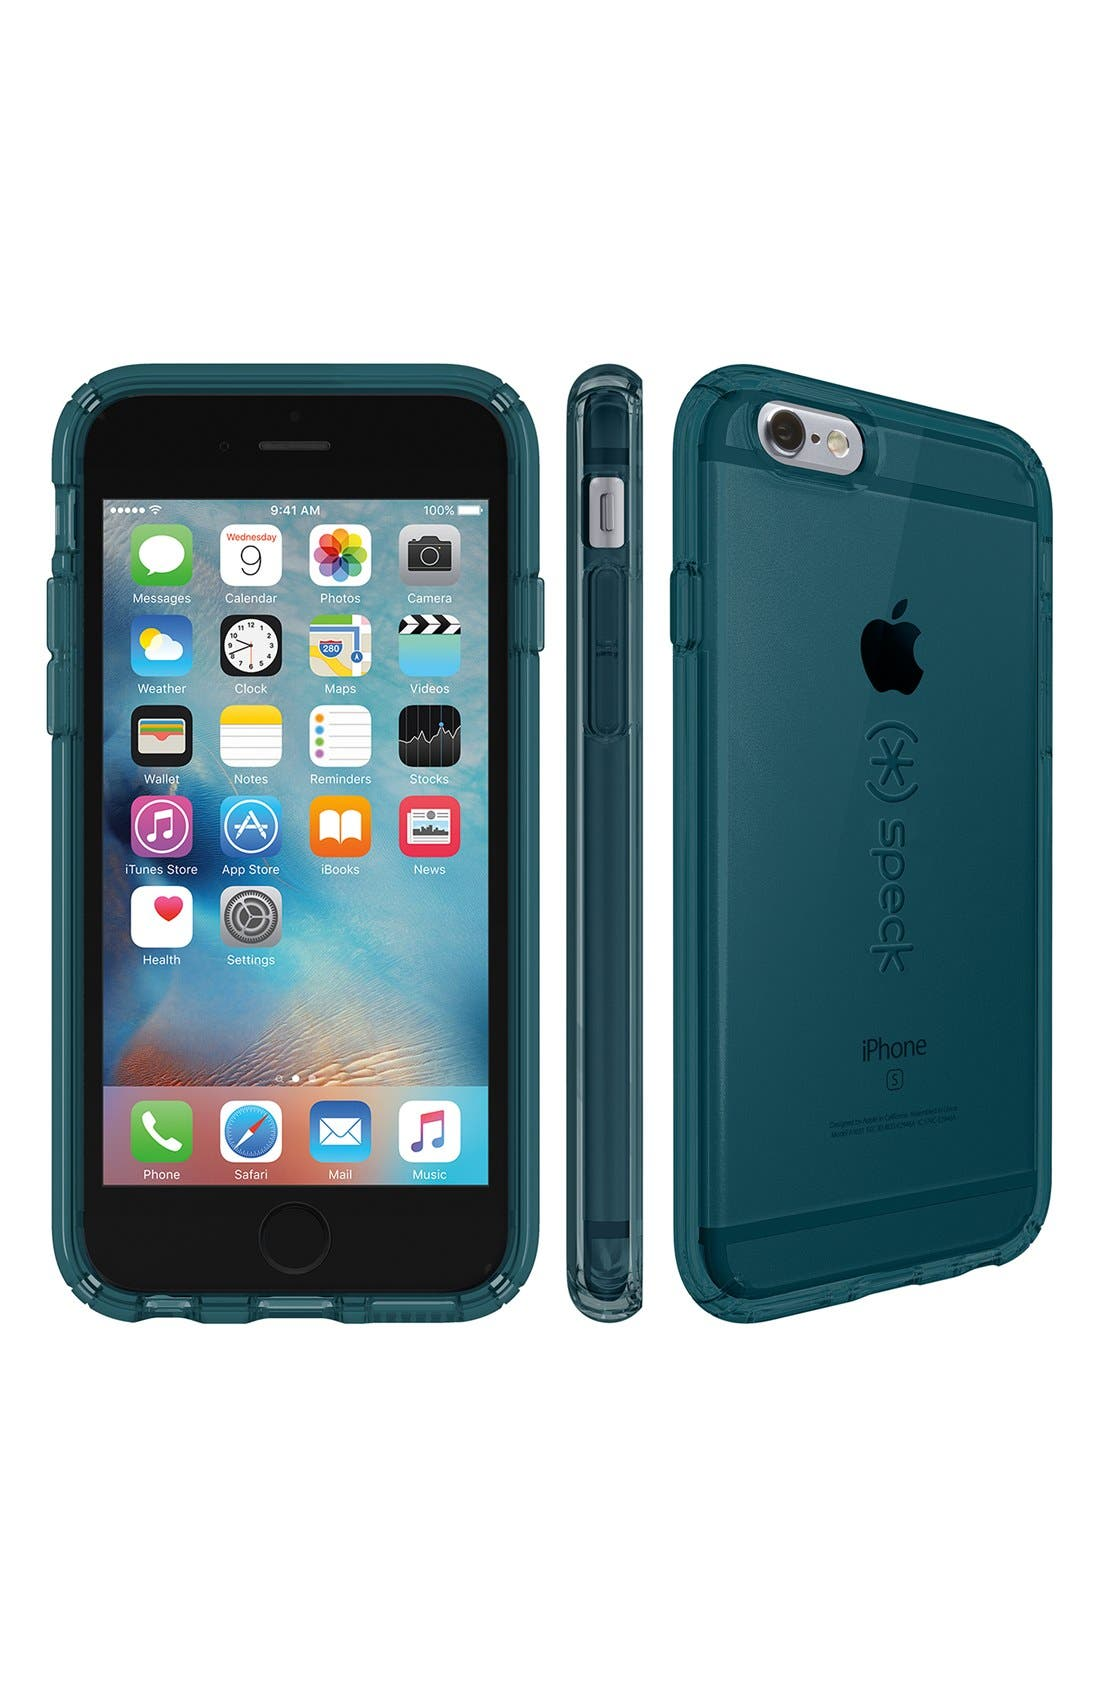 Main Image - Speck Candyshell iPhone 6 Plus & 6s Plus Case